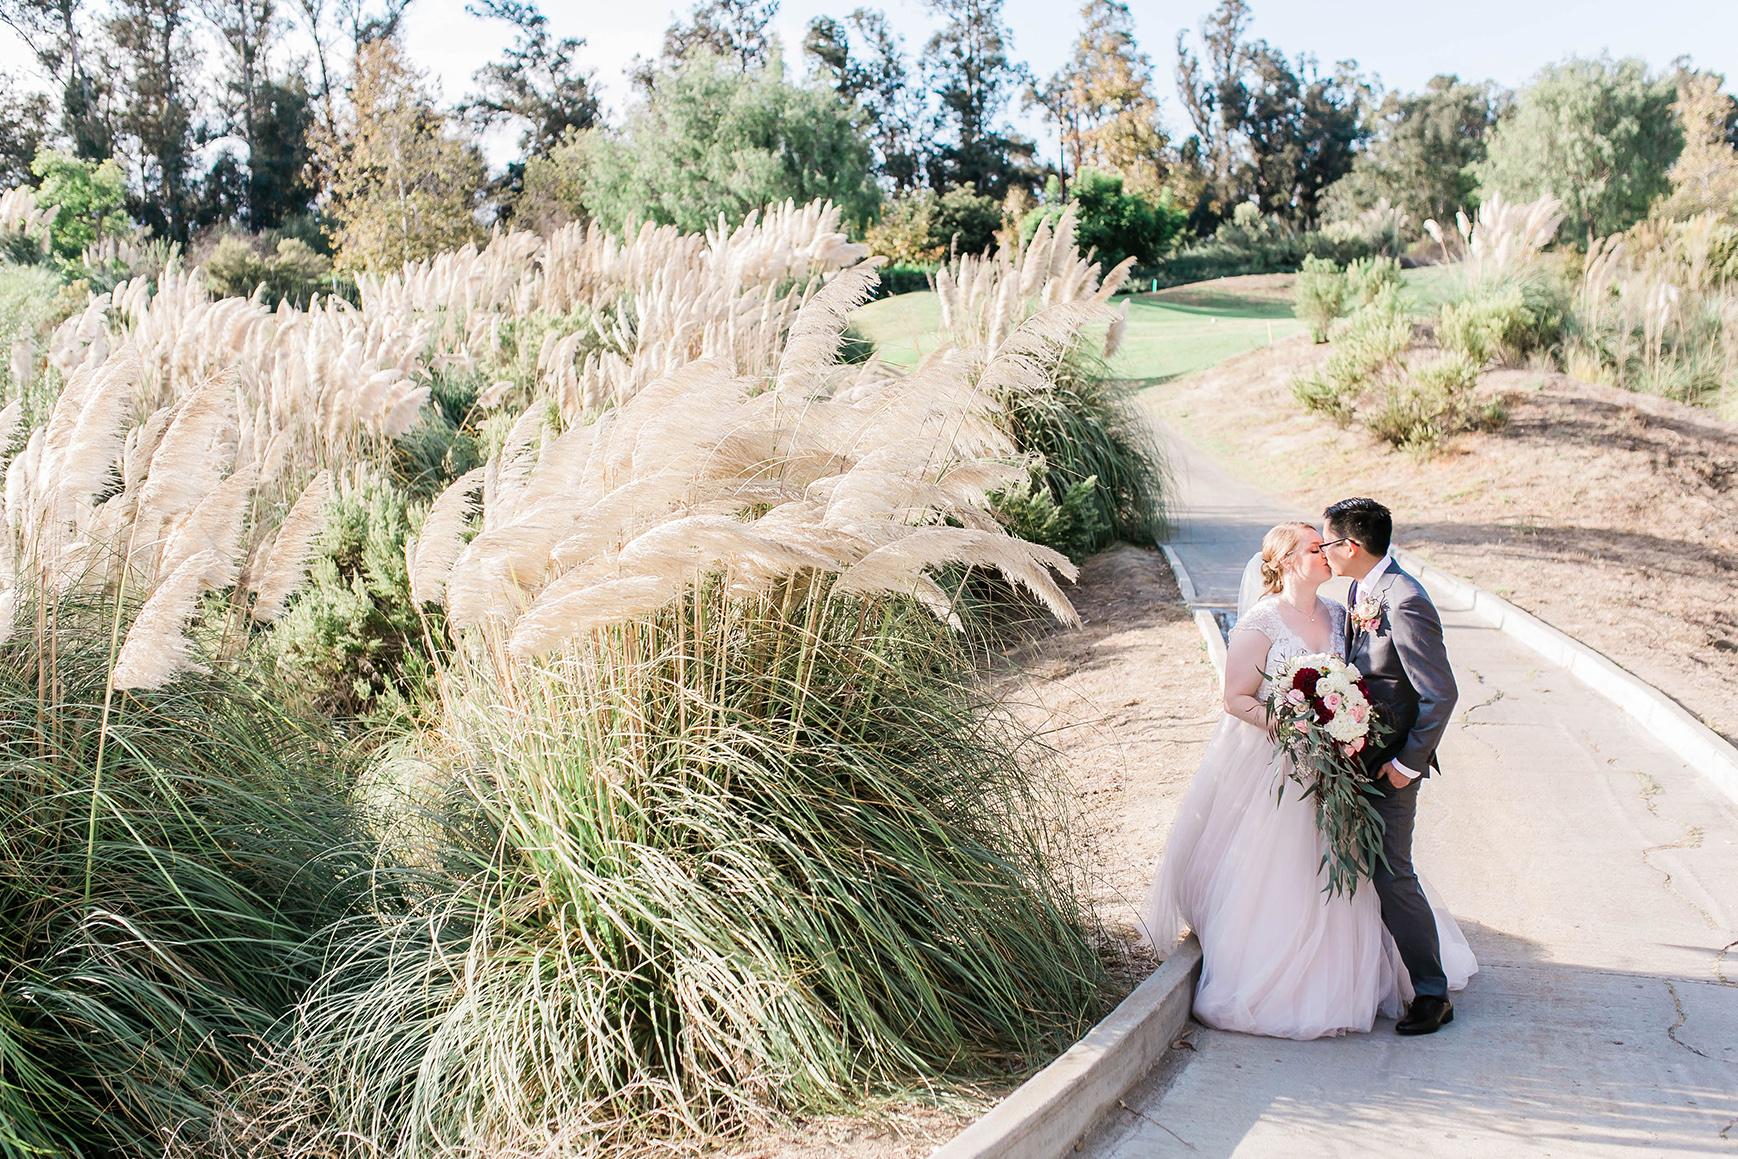 Romantic hideaways for newlywed photos - Sterling Hills - Camarillo, California - Ventura County - Wedgewood Weddings